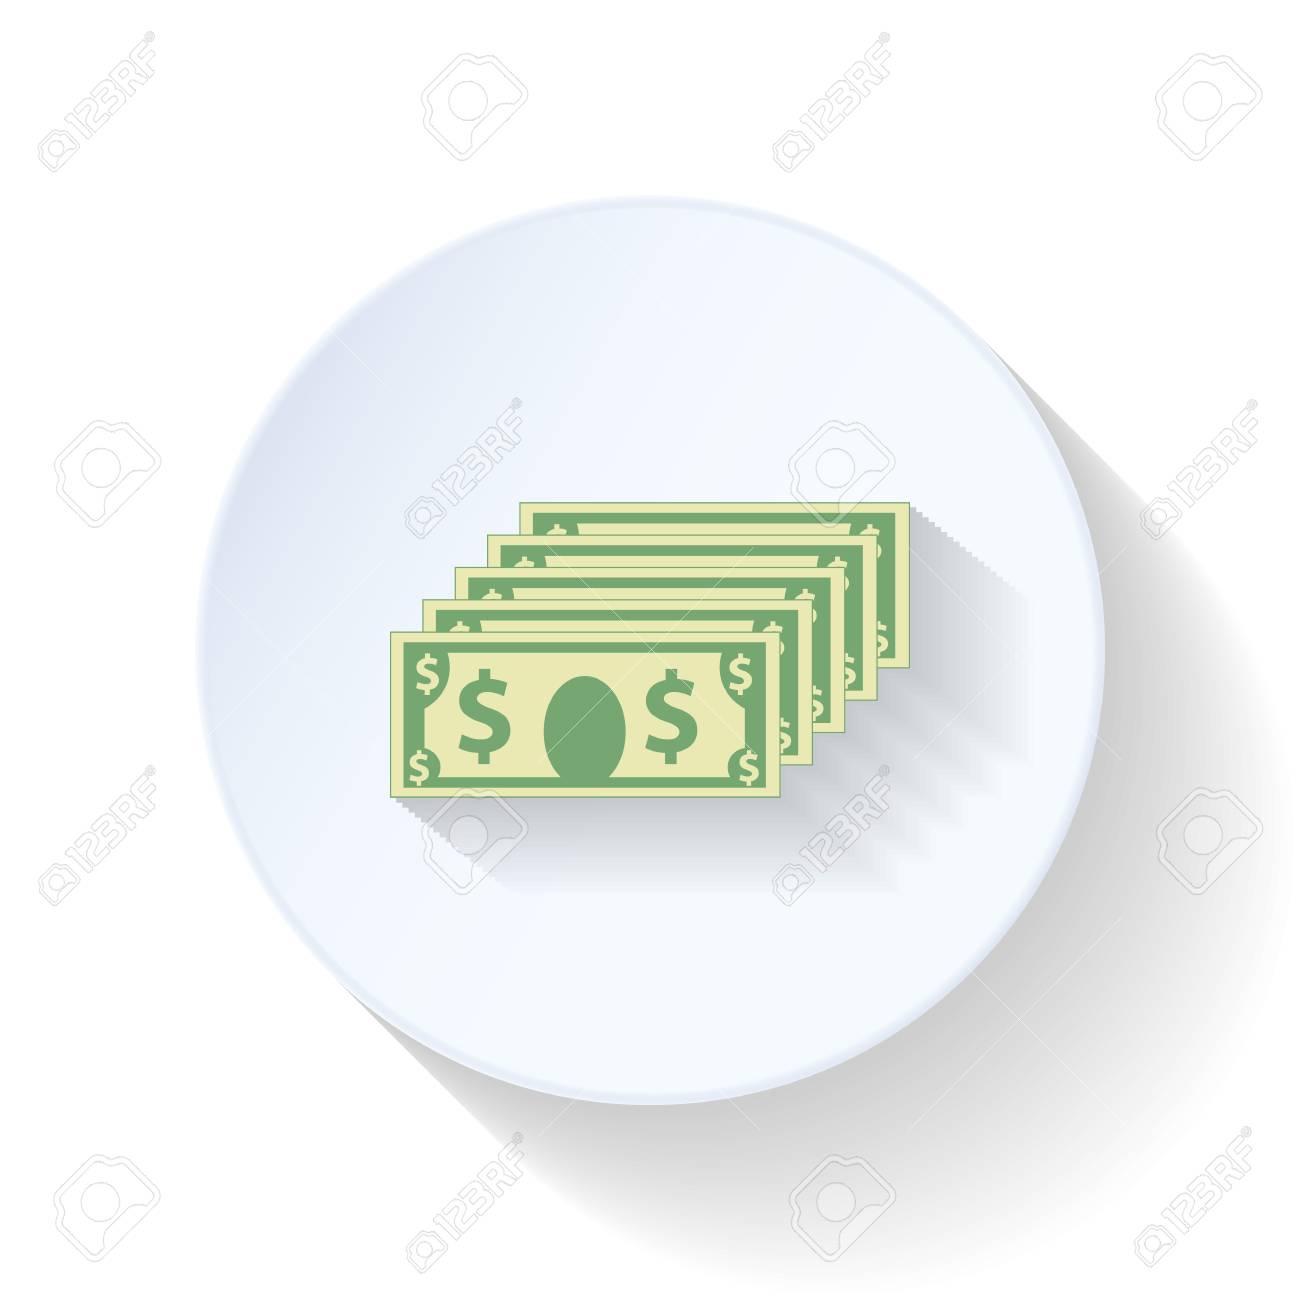 Dollars flat icons set graphic illustration Stock Vector - 26041512